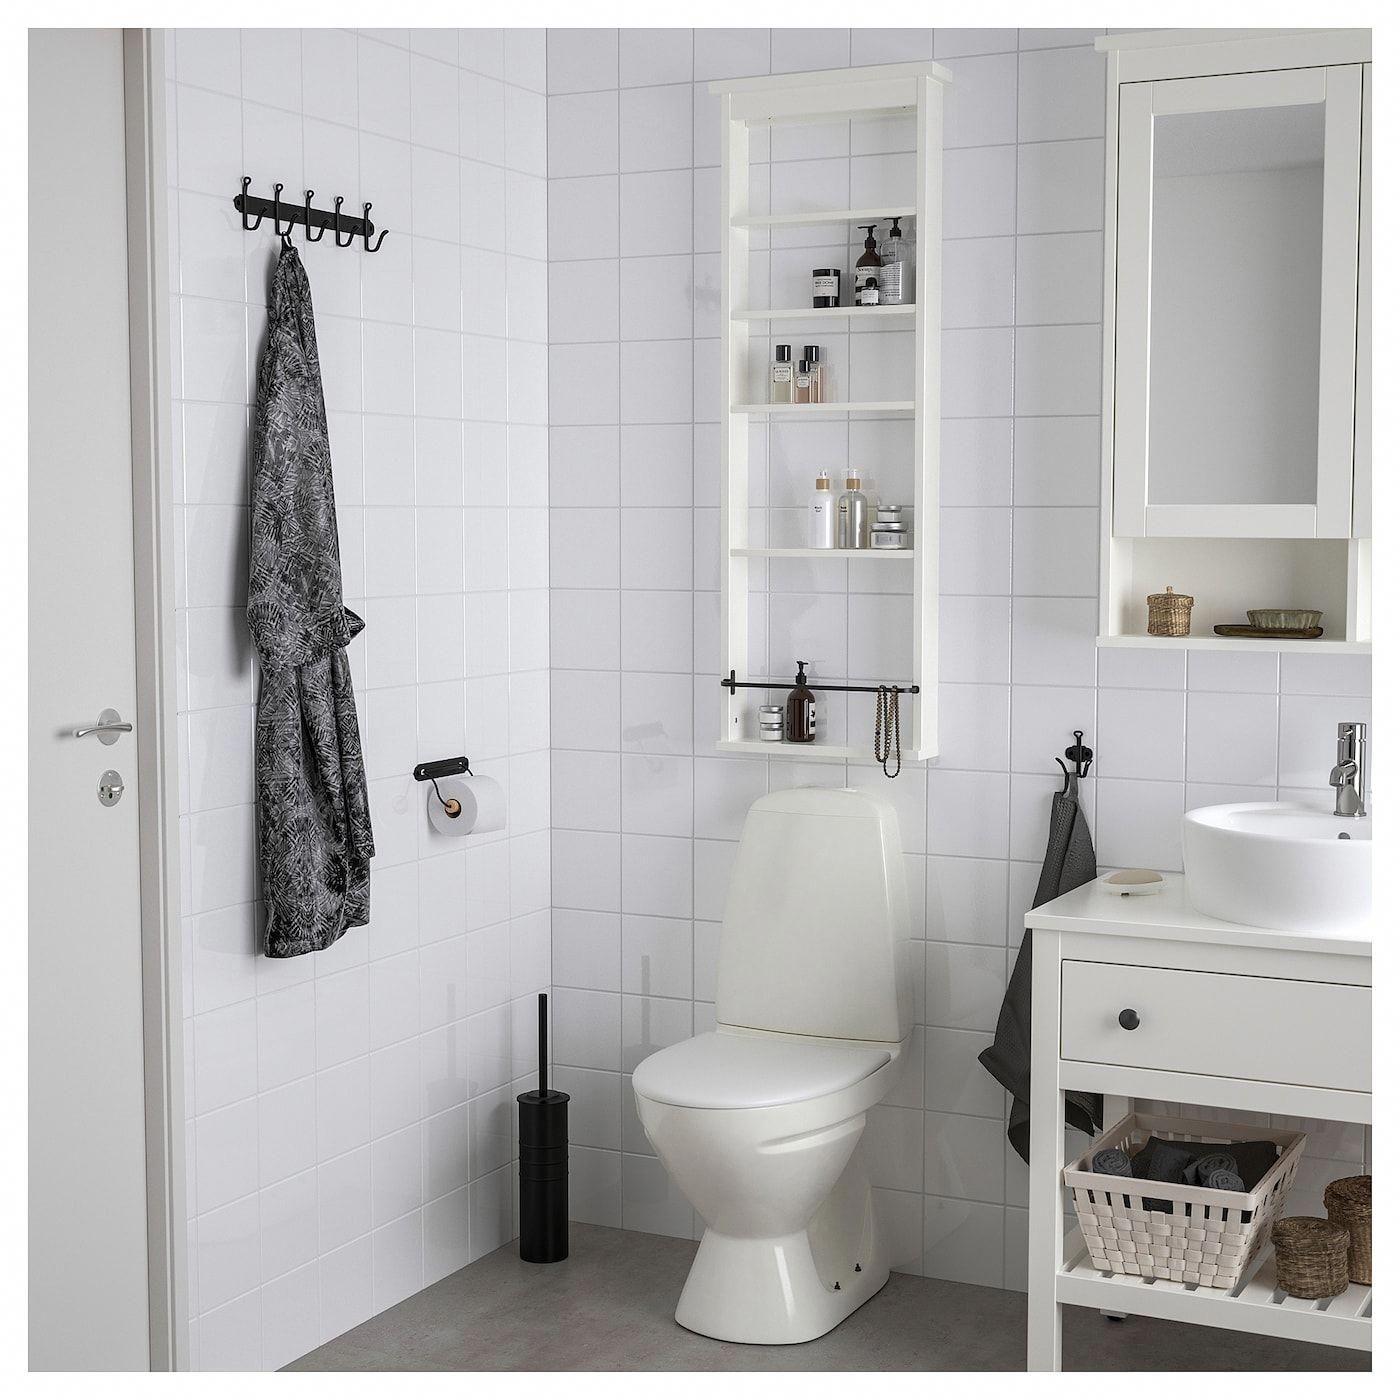 26 Cheap And Easy Diy Bathroom Ideas Anyone Can Do En 2020 Avec Images Etagere Murale Blanche Hemnes Ikea Hemnes